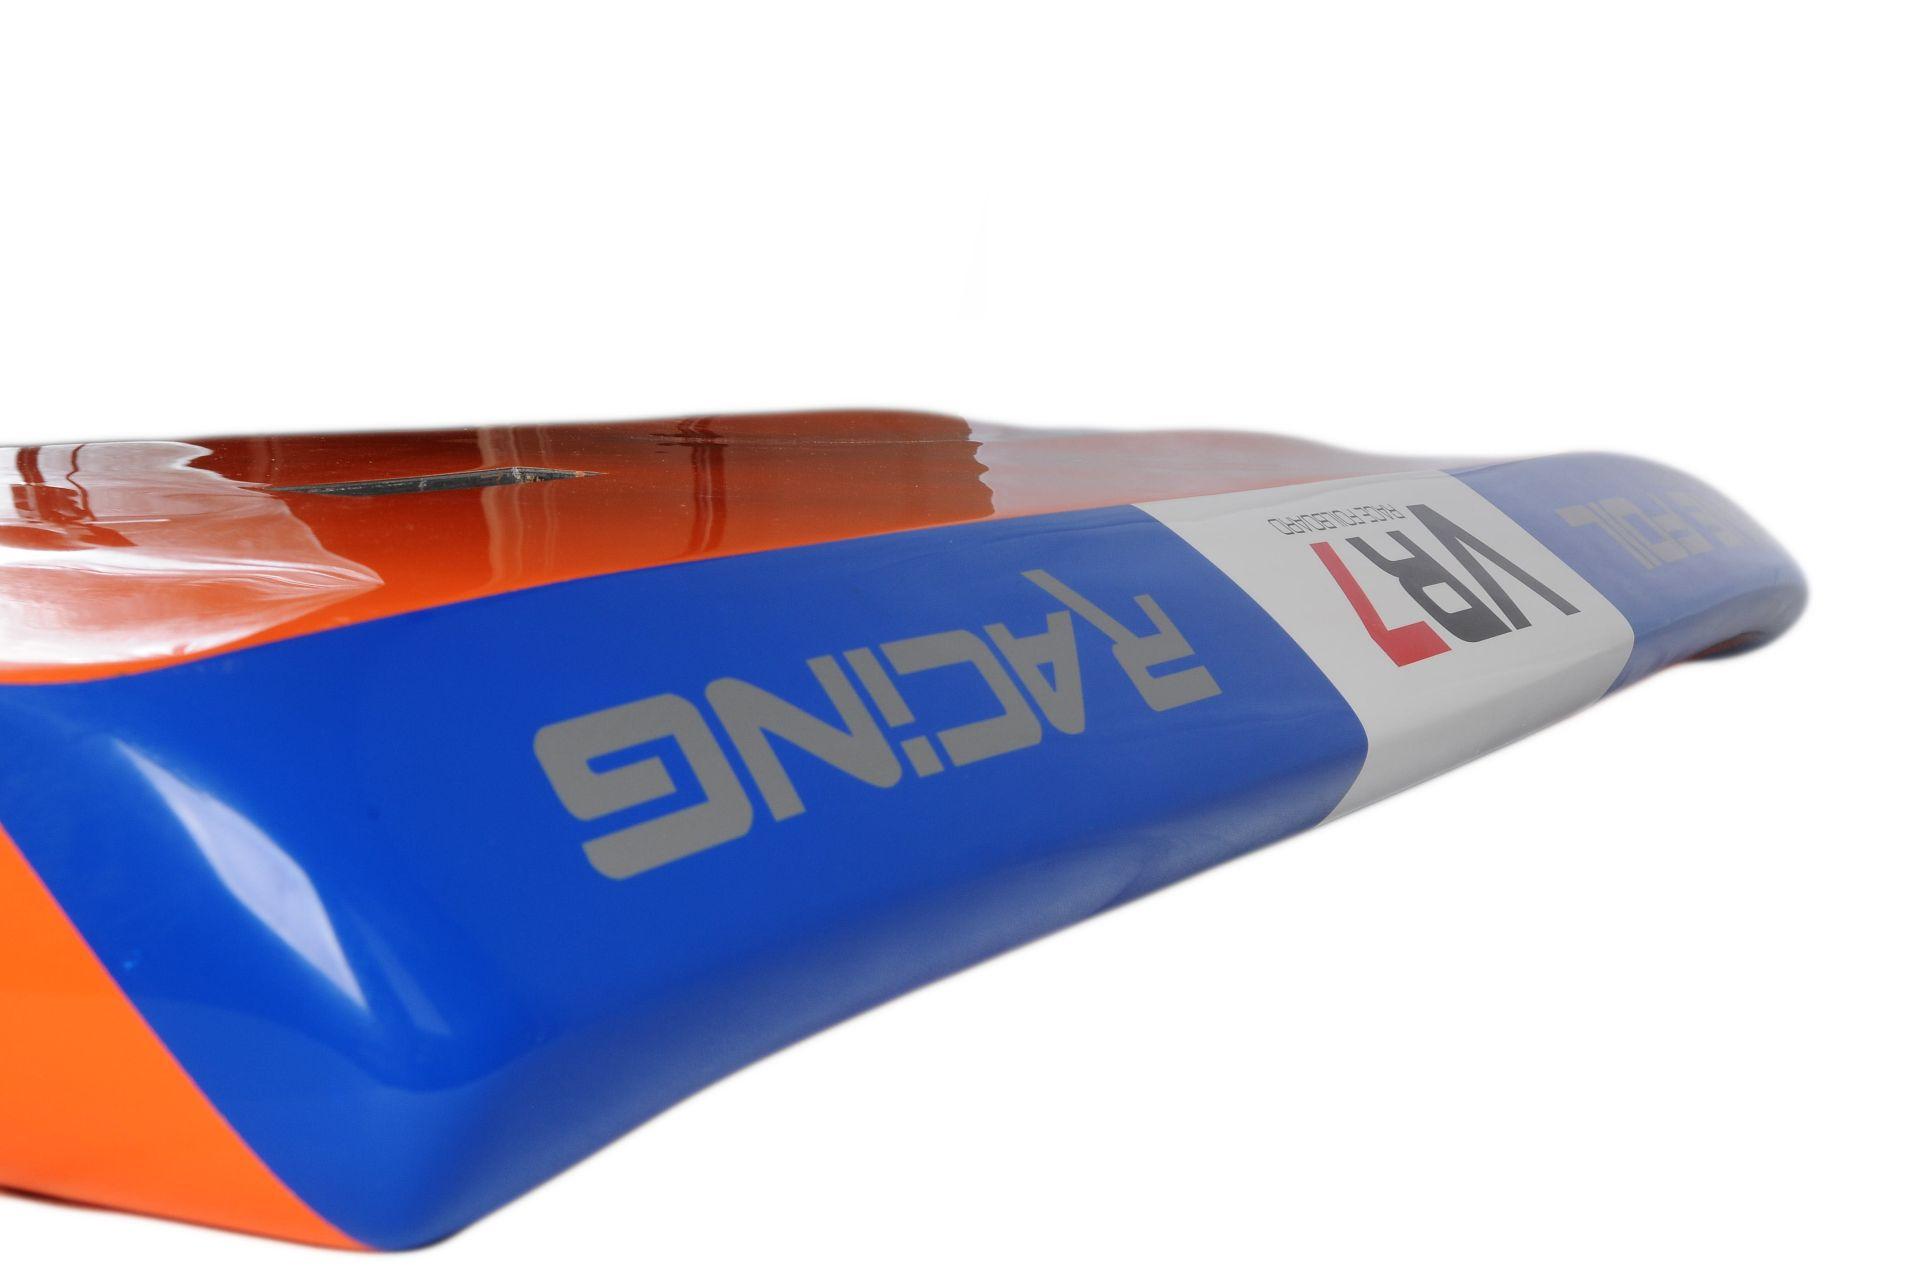 Kitefoil foilboard alpinefoil vr7 2 1 2